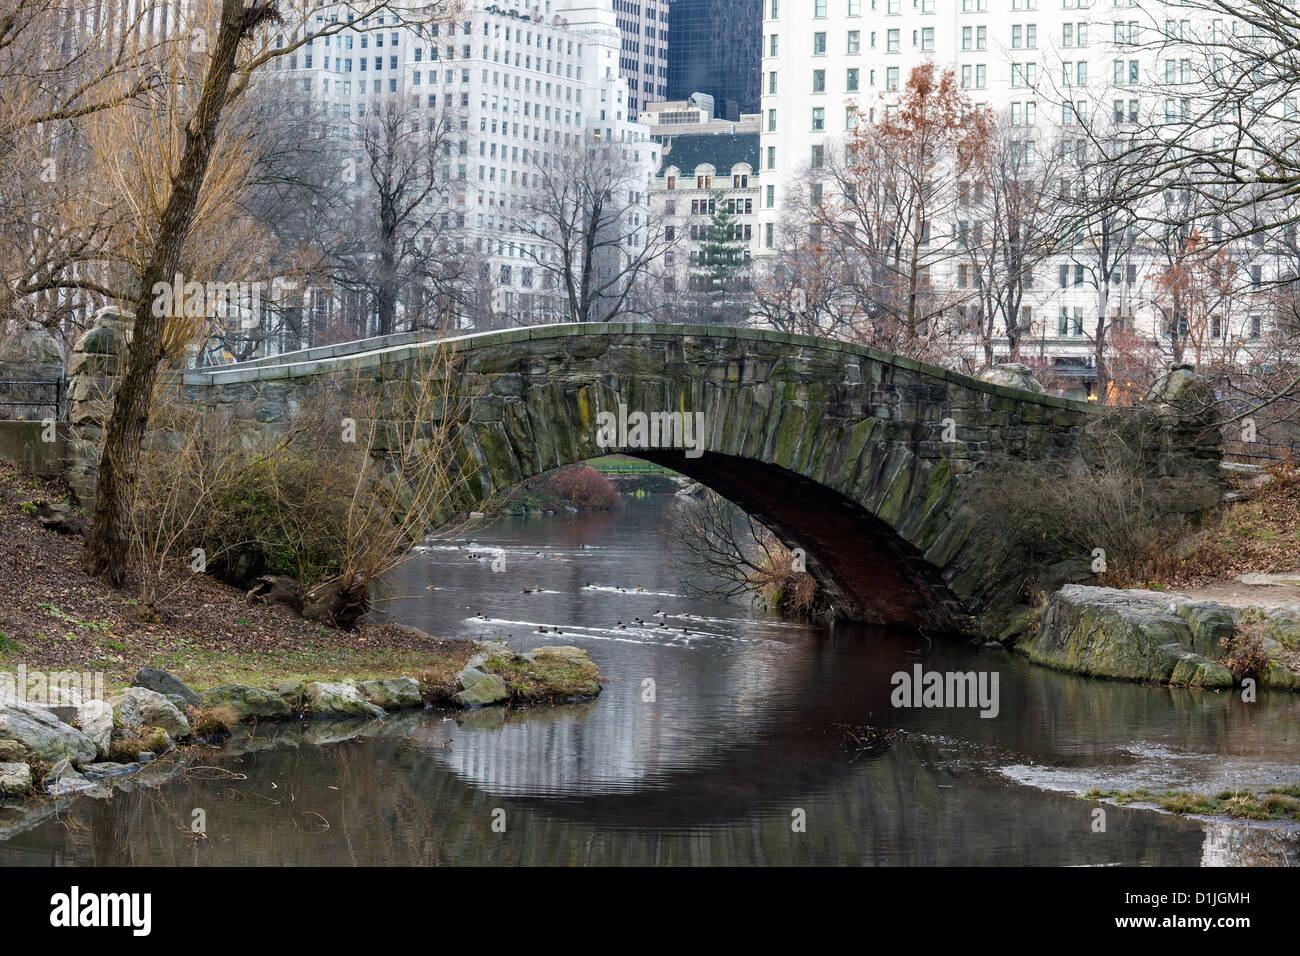 Central Park New York City Gapstow bridge - Stock Image